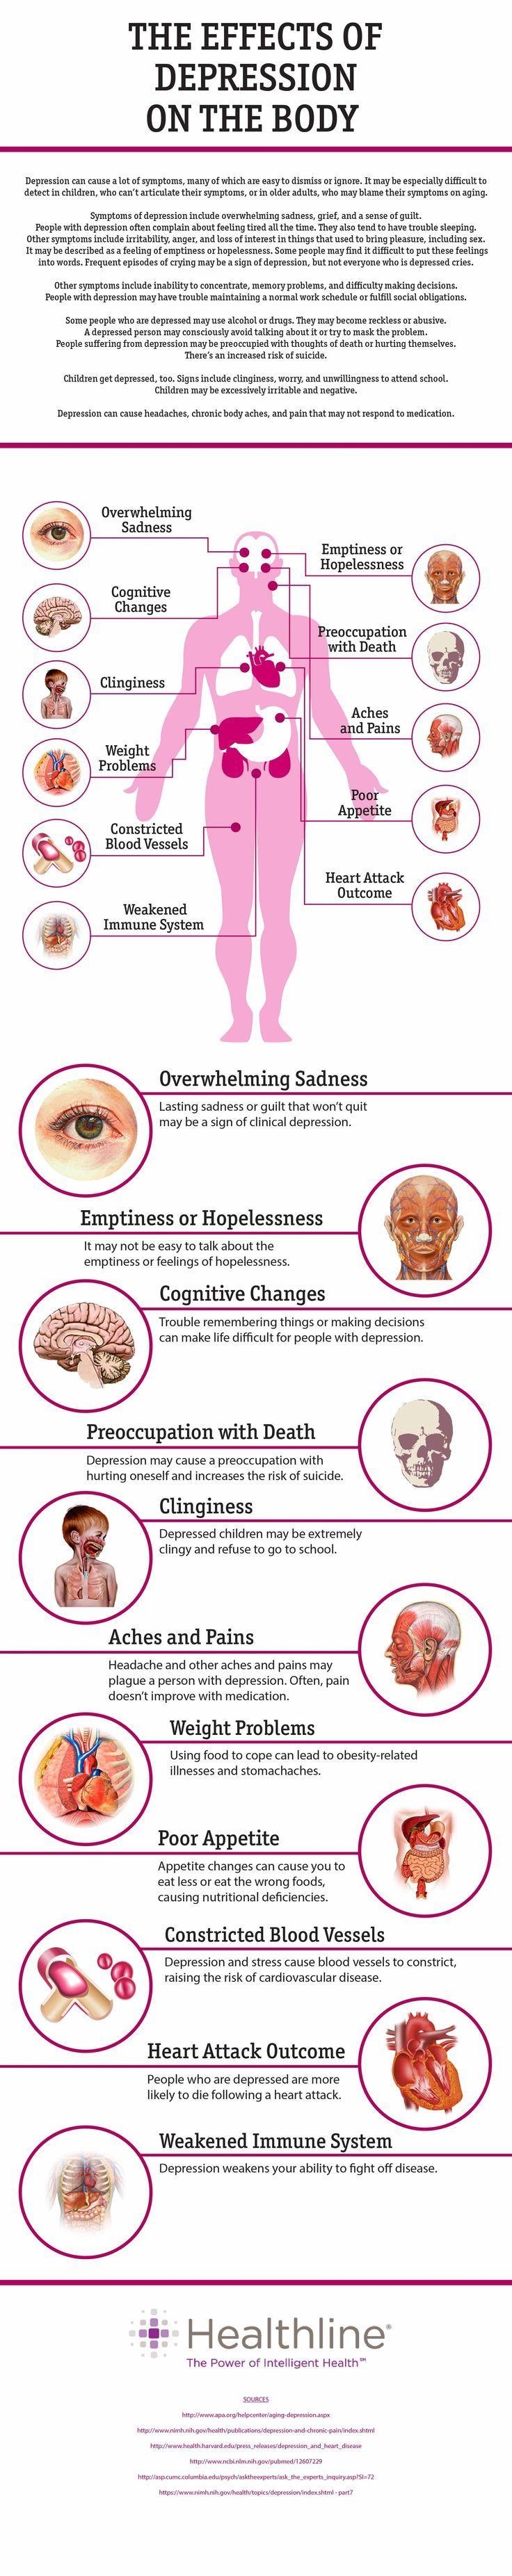 The Effects of Depression on the Body• pinterest & instagram - @ninabubblygum •